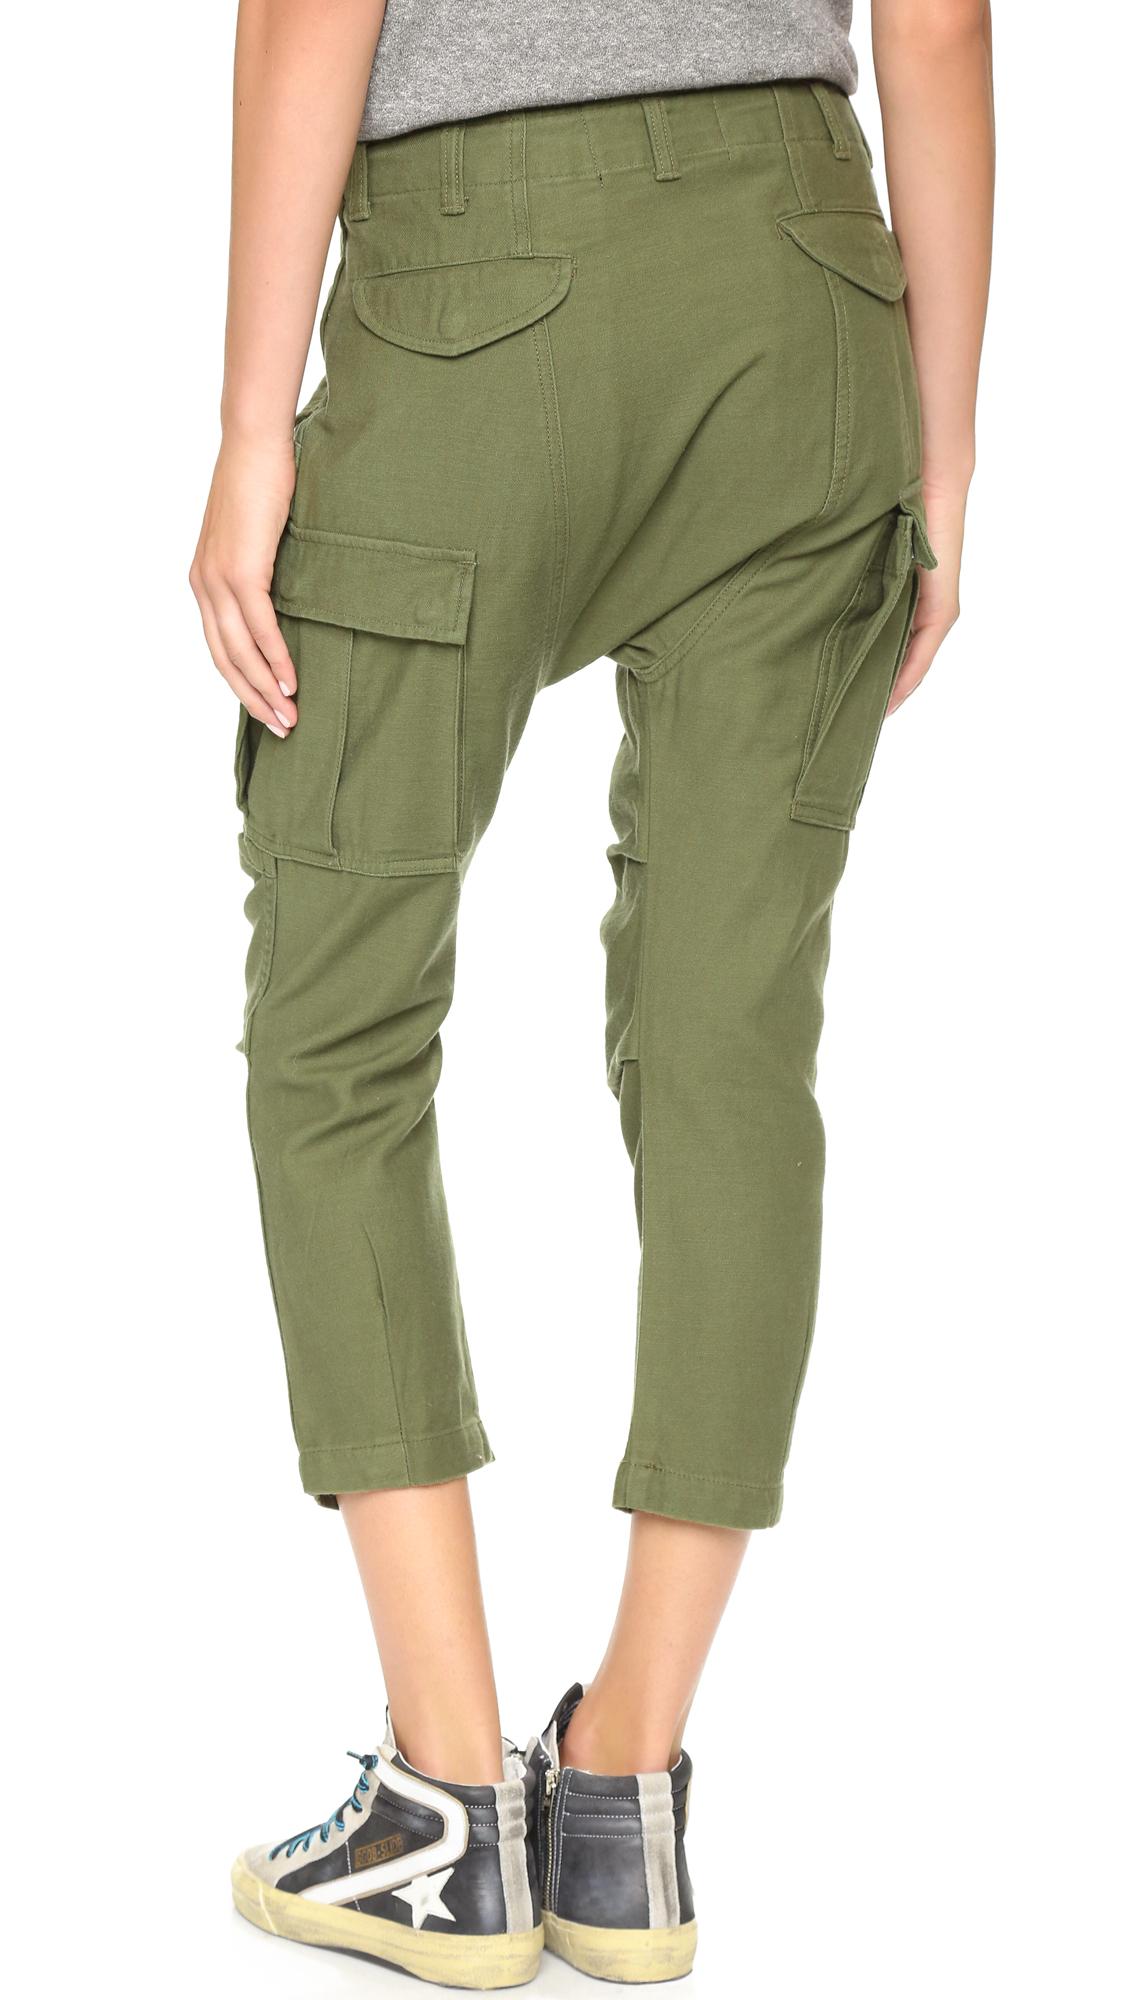 Wonderful Dickies Olive Green Loose Fit Cargo Pant  Uncle Sams Army Navy